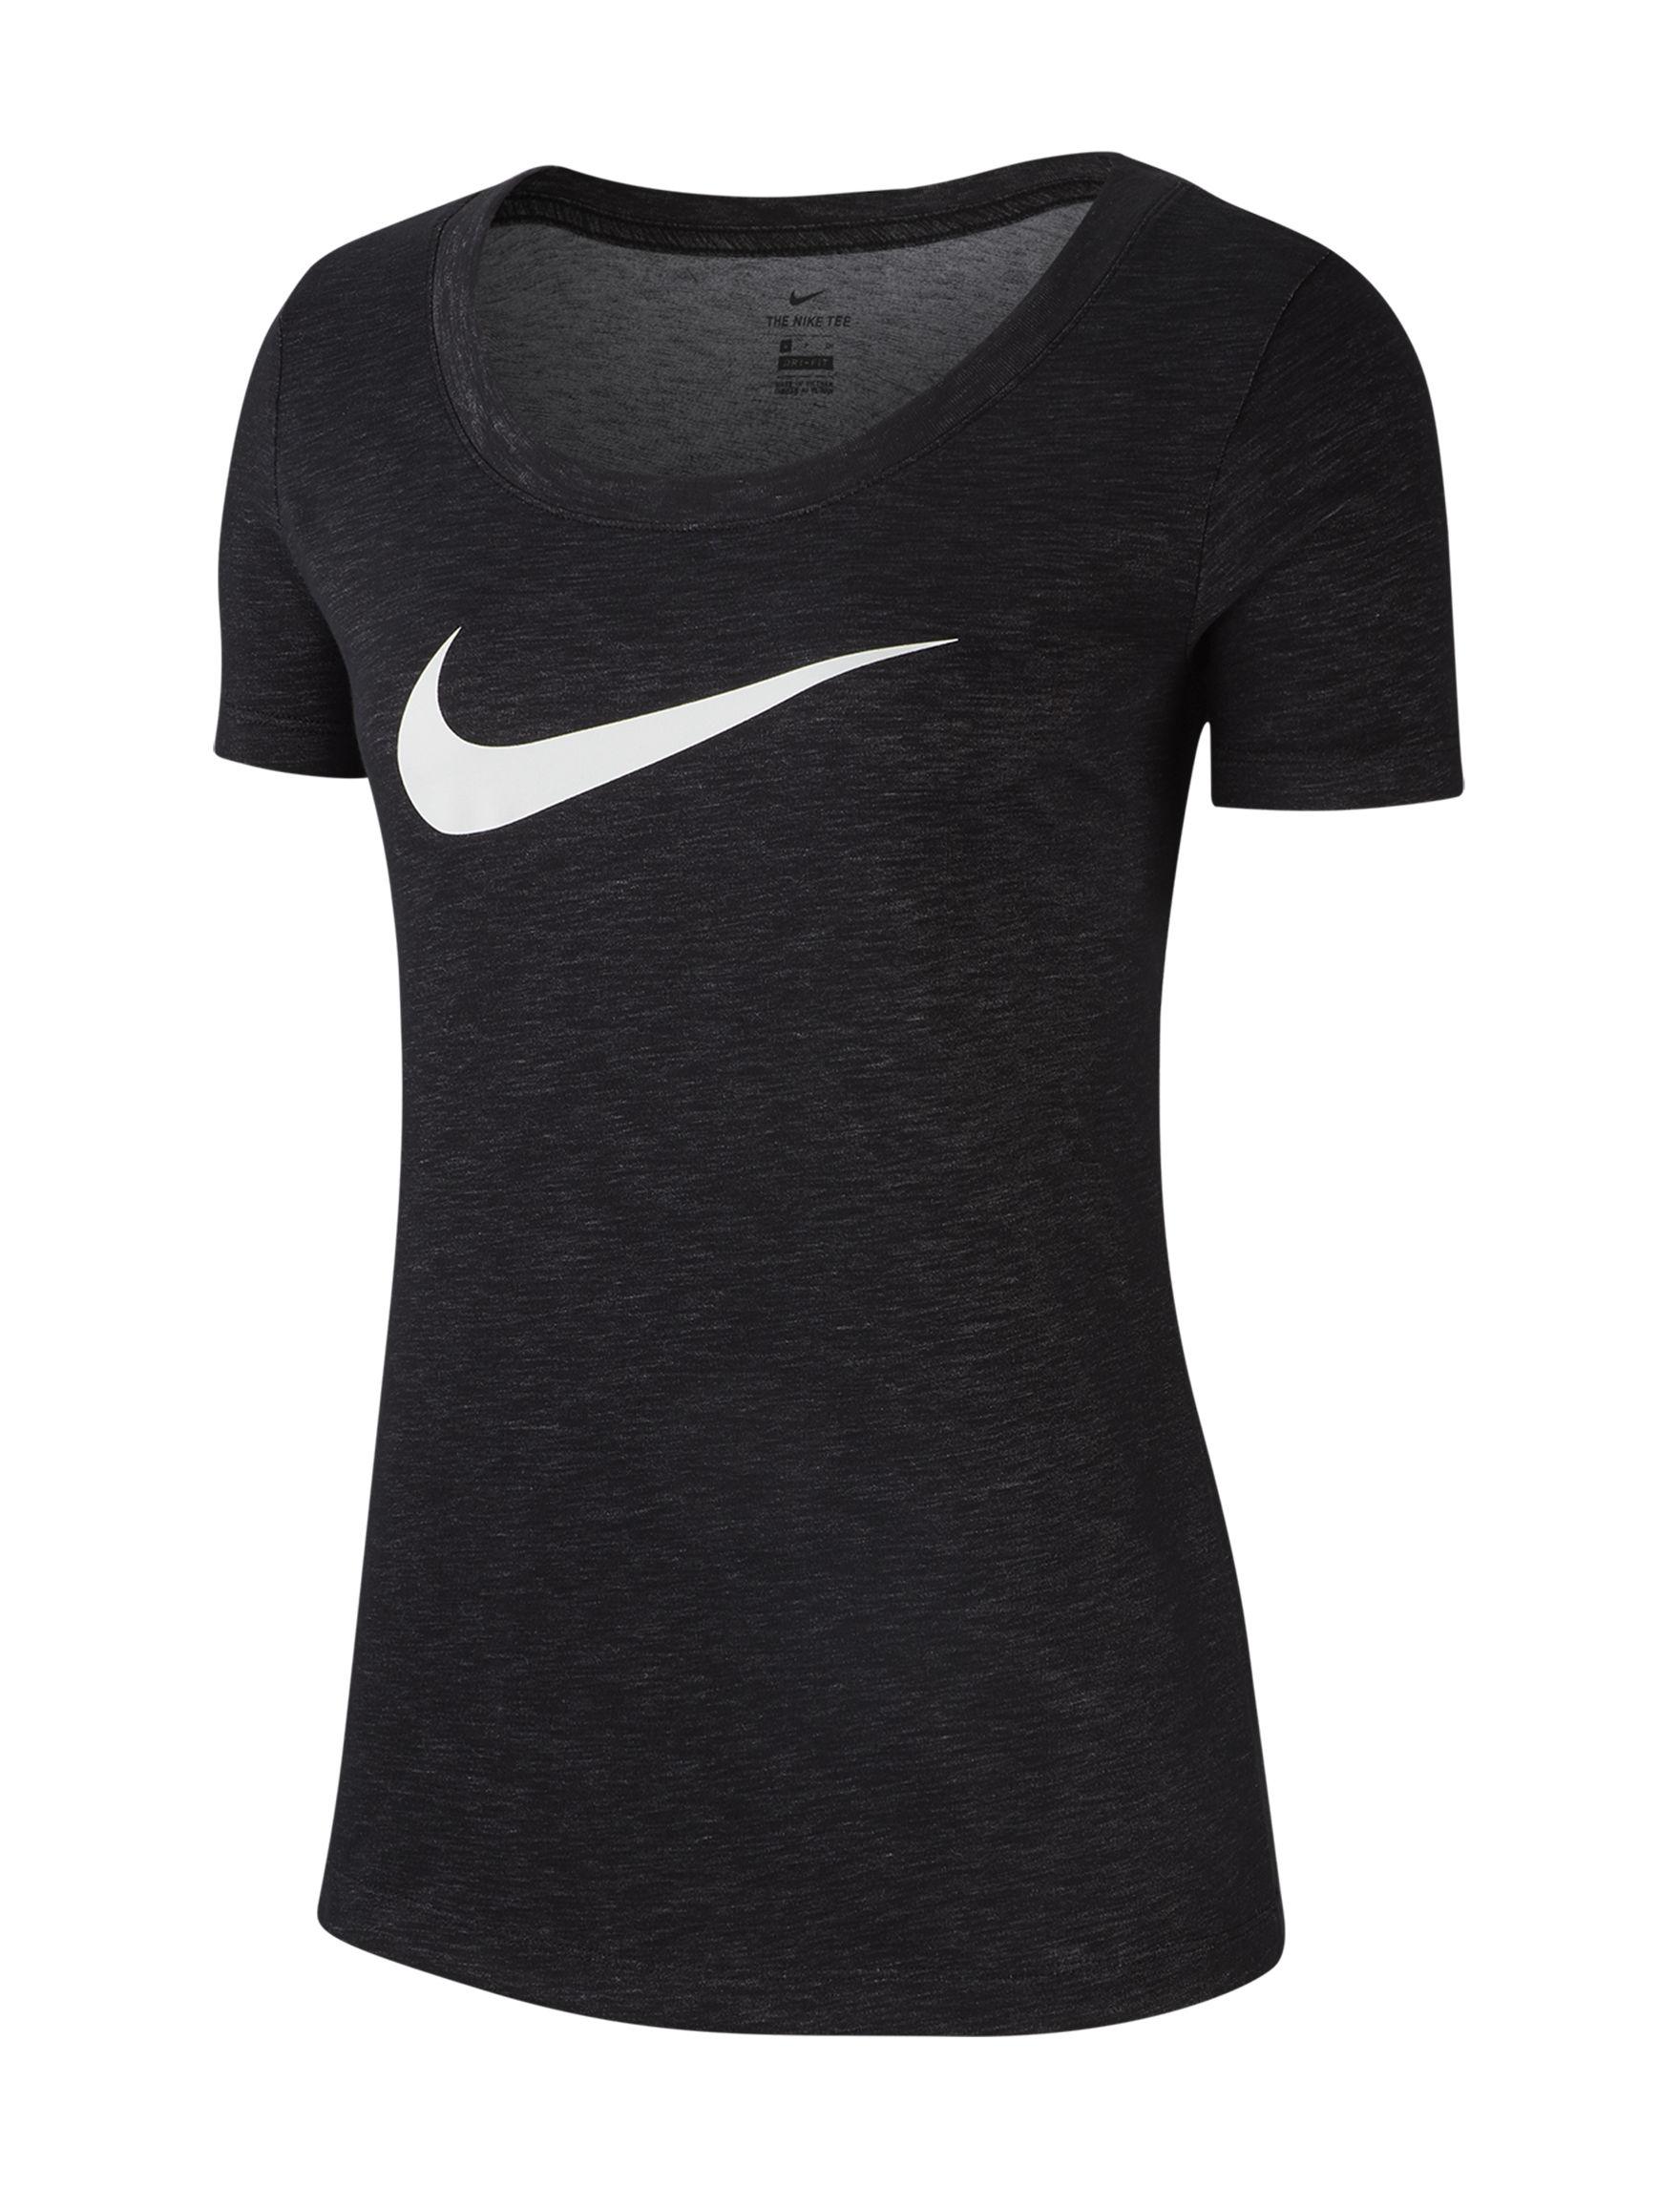 Nike Black Active Tees & Tanks